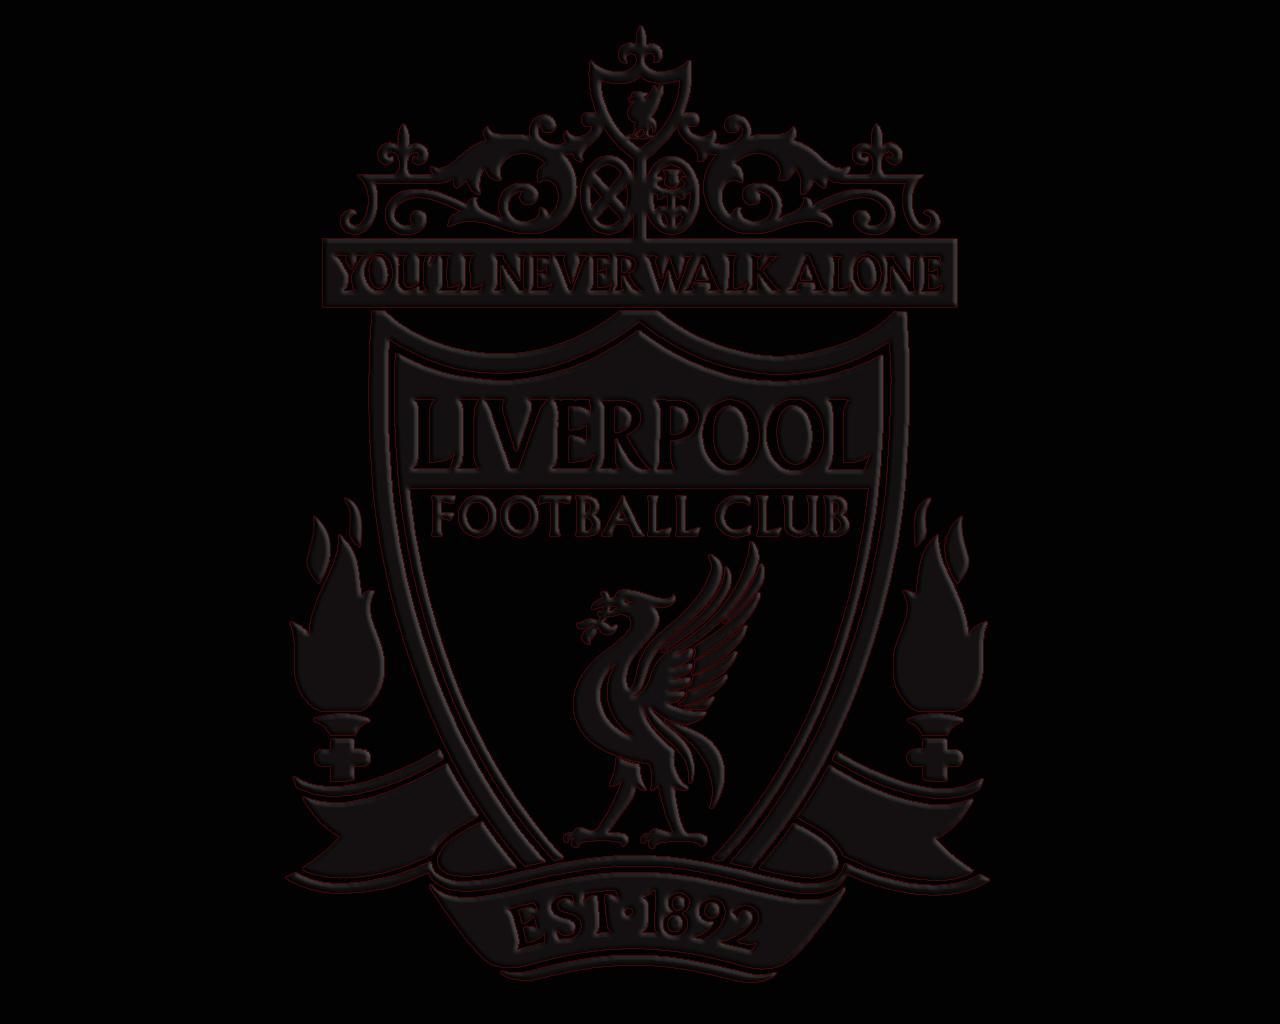 Liverpool Desktop Black Wallpapers Wallpaper Cave